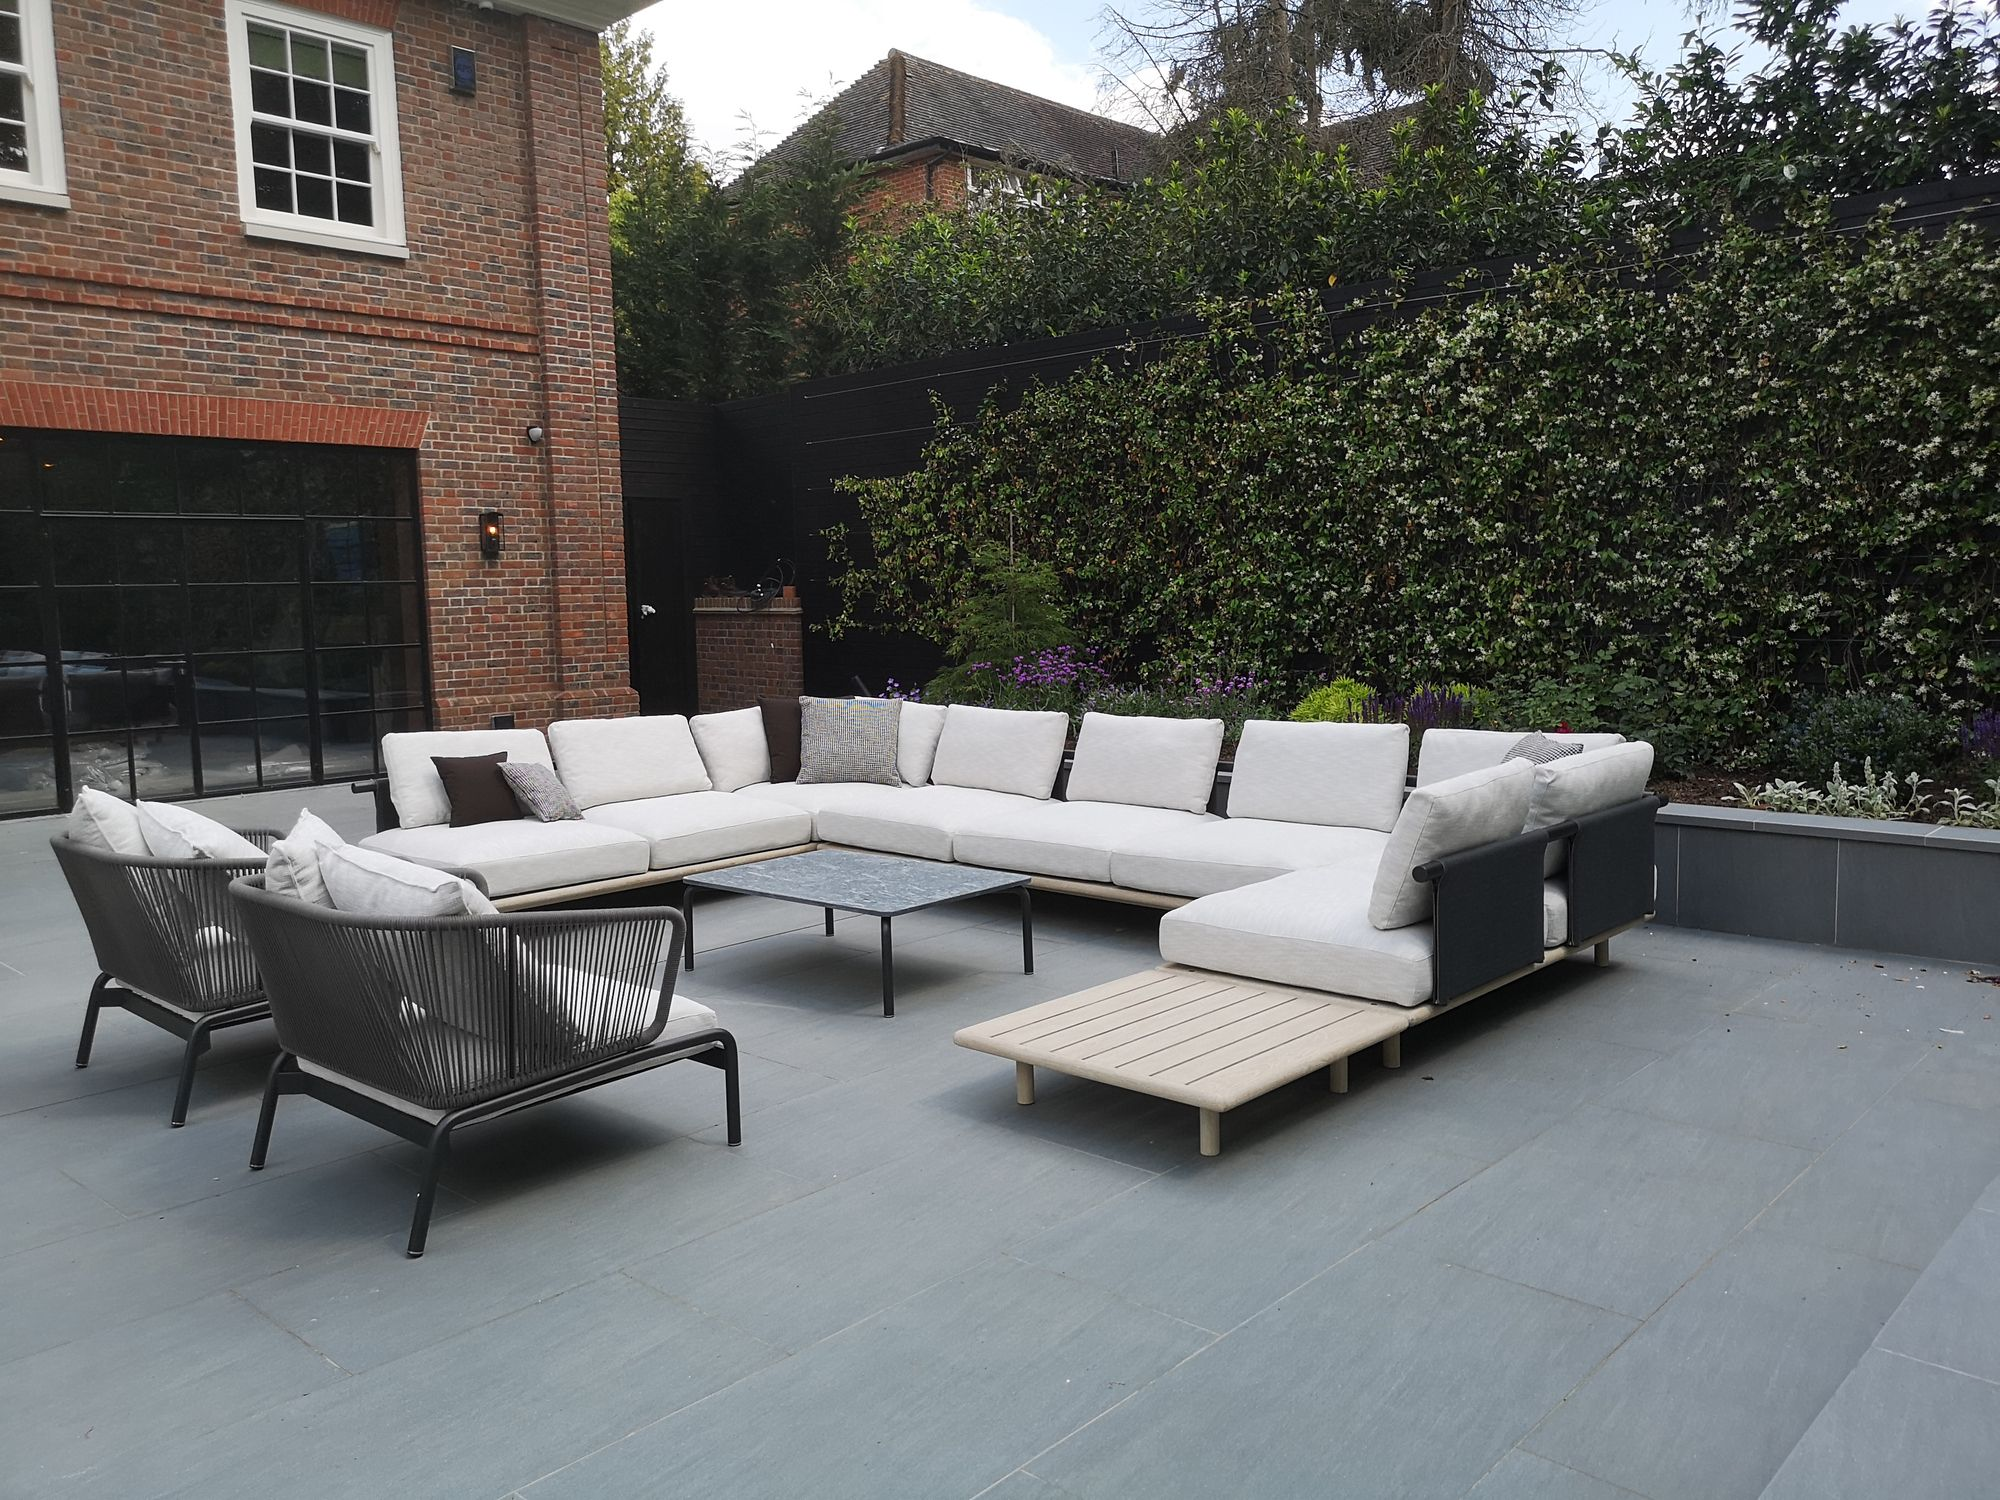 Eden Luxury Outdoor Sofa By Roda Italian Garden Furniture Company In 2020 Modern Garden Furniture Outdoor Sofa Garden Furniture Uk